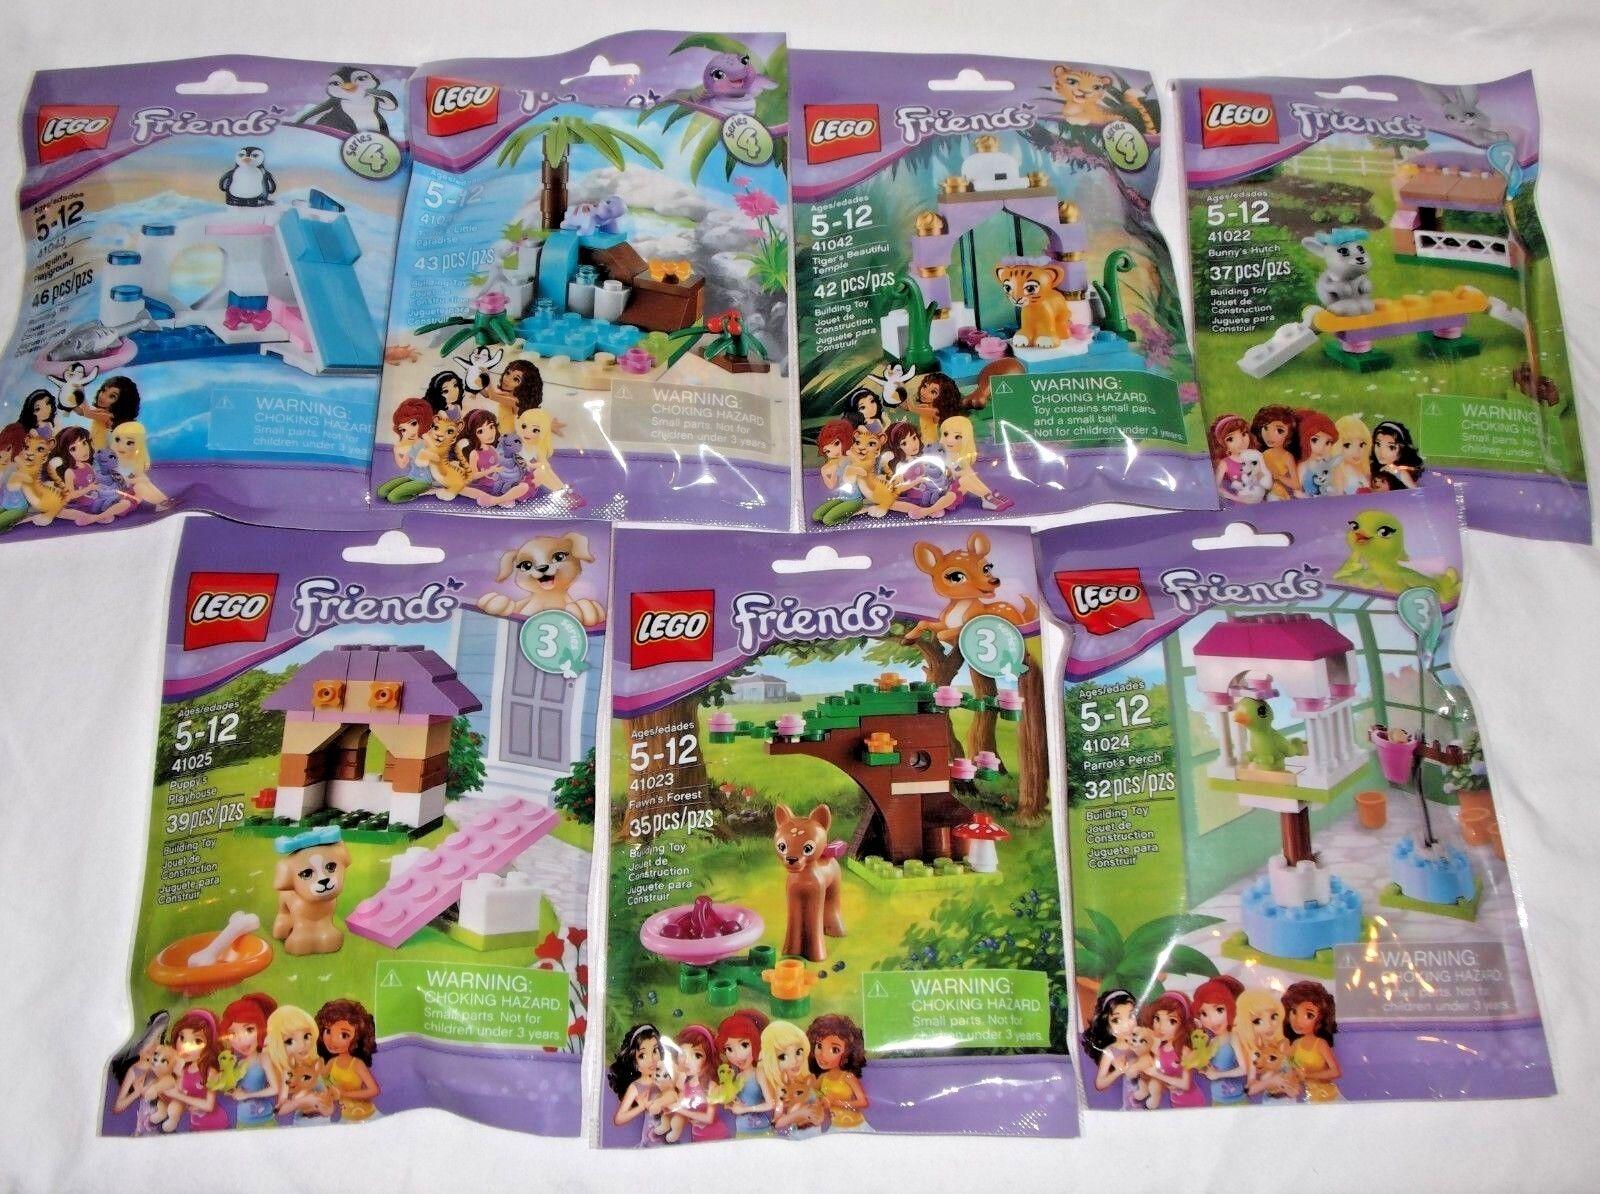 LEGO sealed POLYBAG lot x7 41023 41043 41041 41022 41042 41025 41024 FRIENDS set